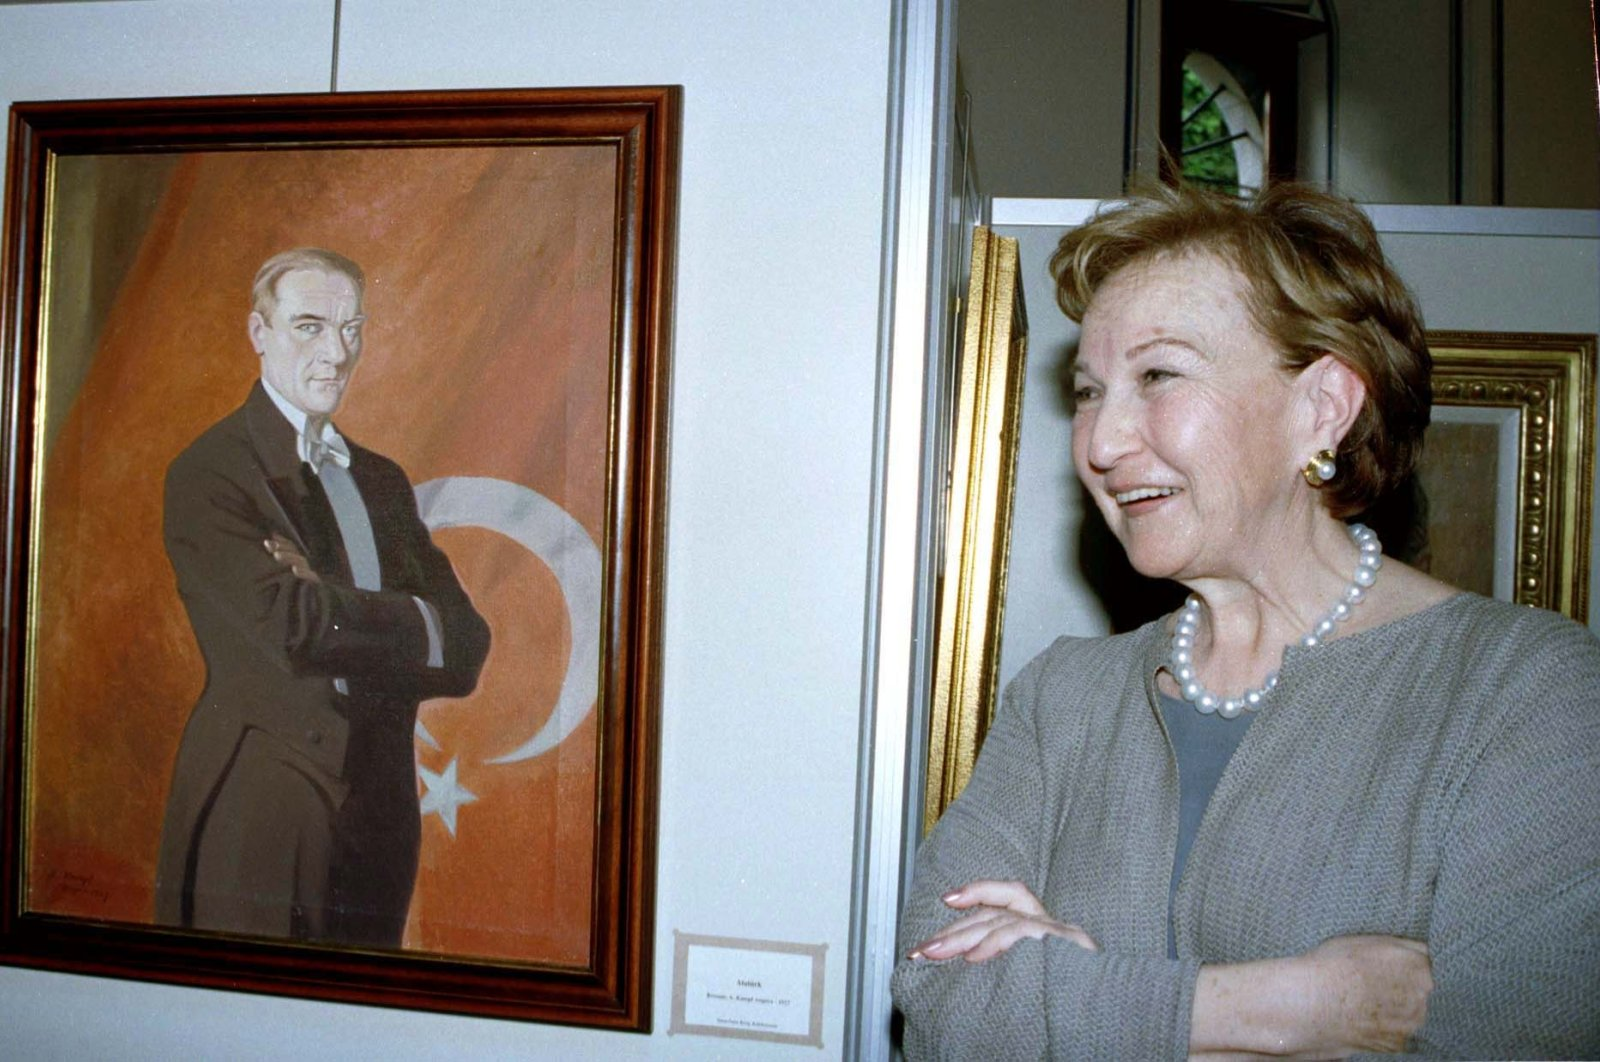 Suna Kıraç poses during an exhibition, in Antalya, southern Turkey, May 19, 1999. (AA Photo)